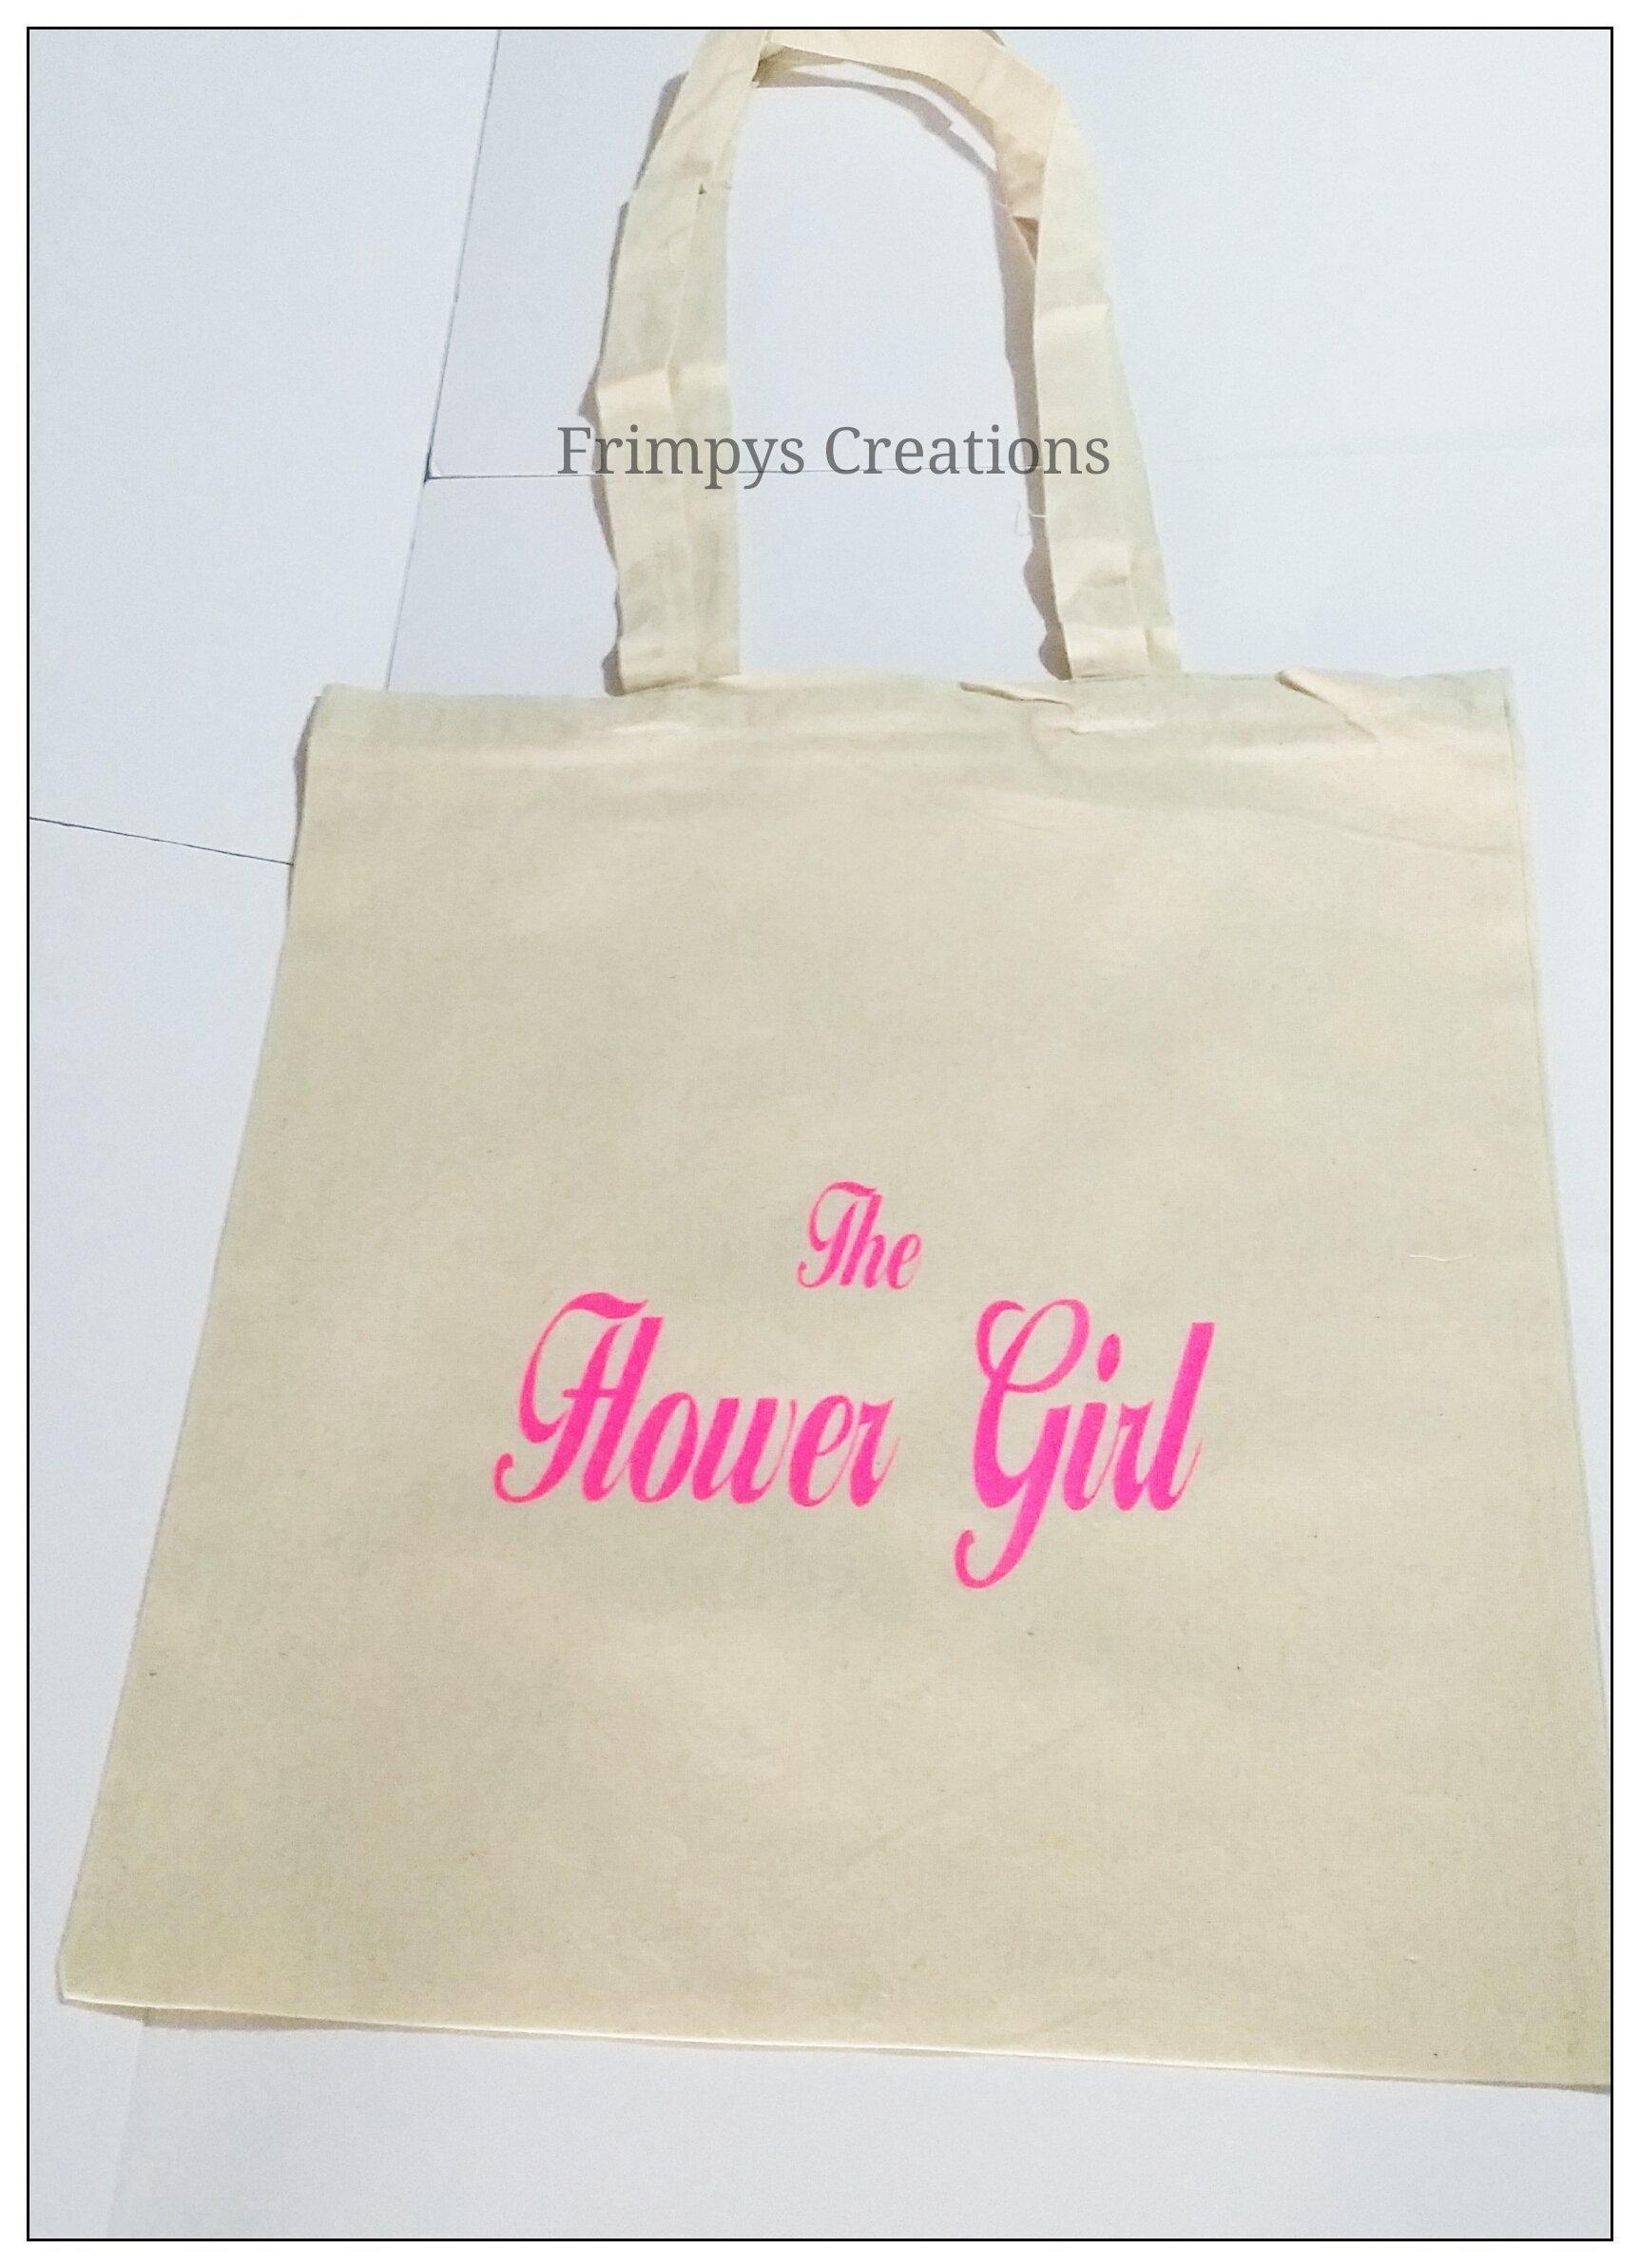 Wedding Favour Tote Bag cotton Printed Gift Present Keep The Flower Girl Novelty (BAG) - handmade-bags